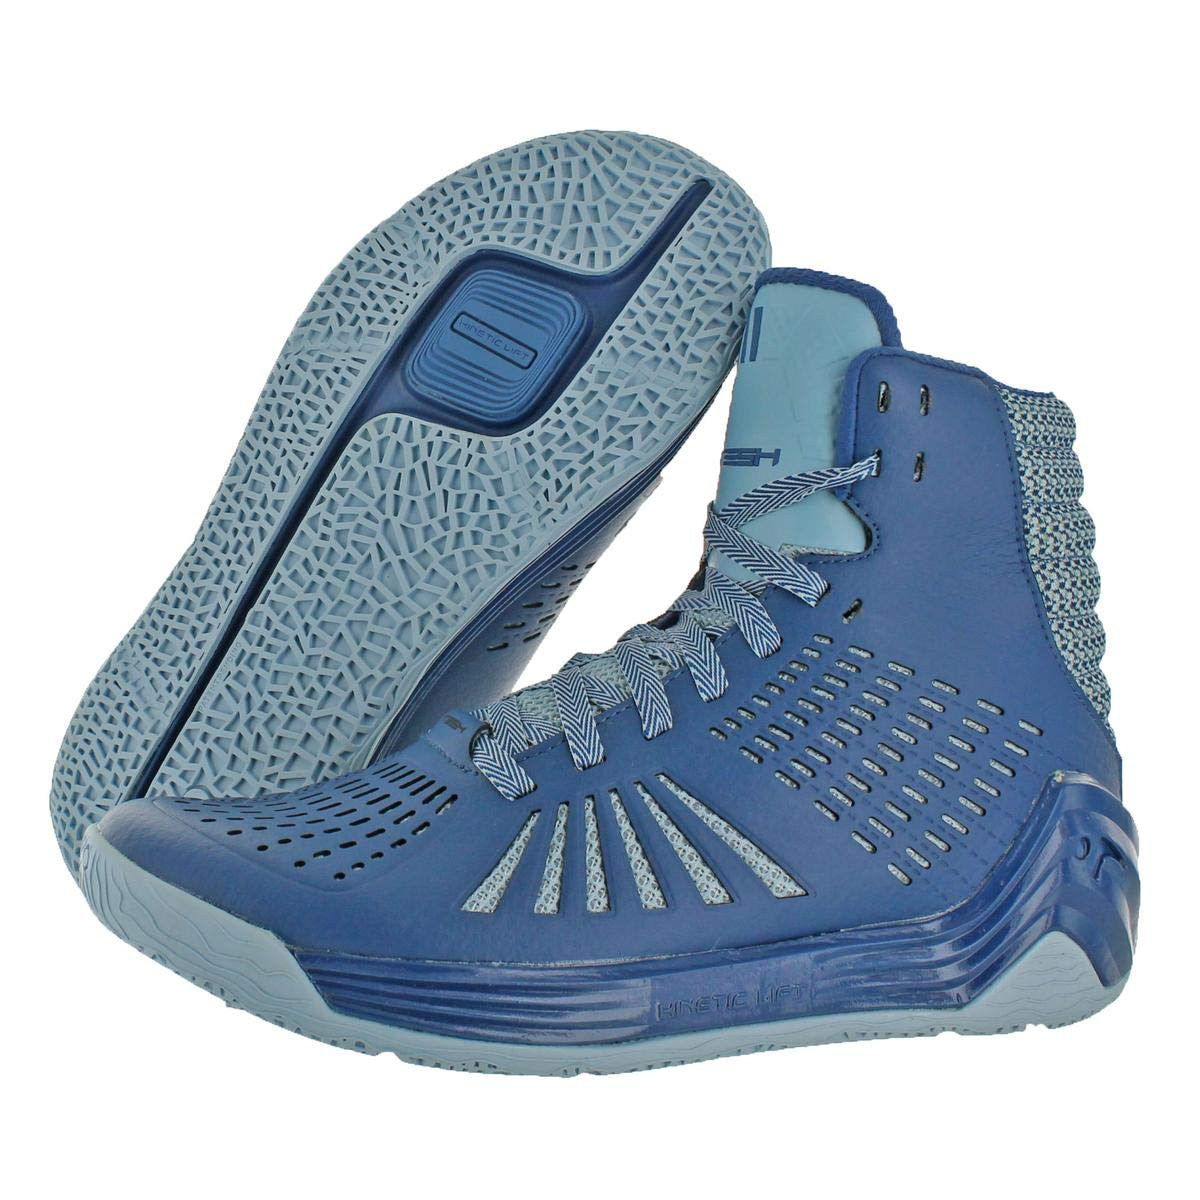 44e5d9a79a9e Tesh Trigger Men Black Basketball Shoe